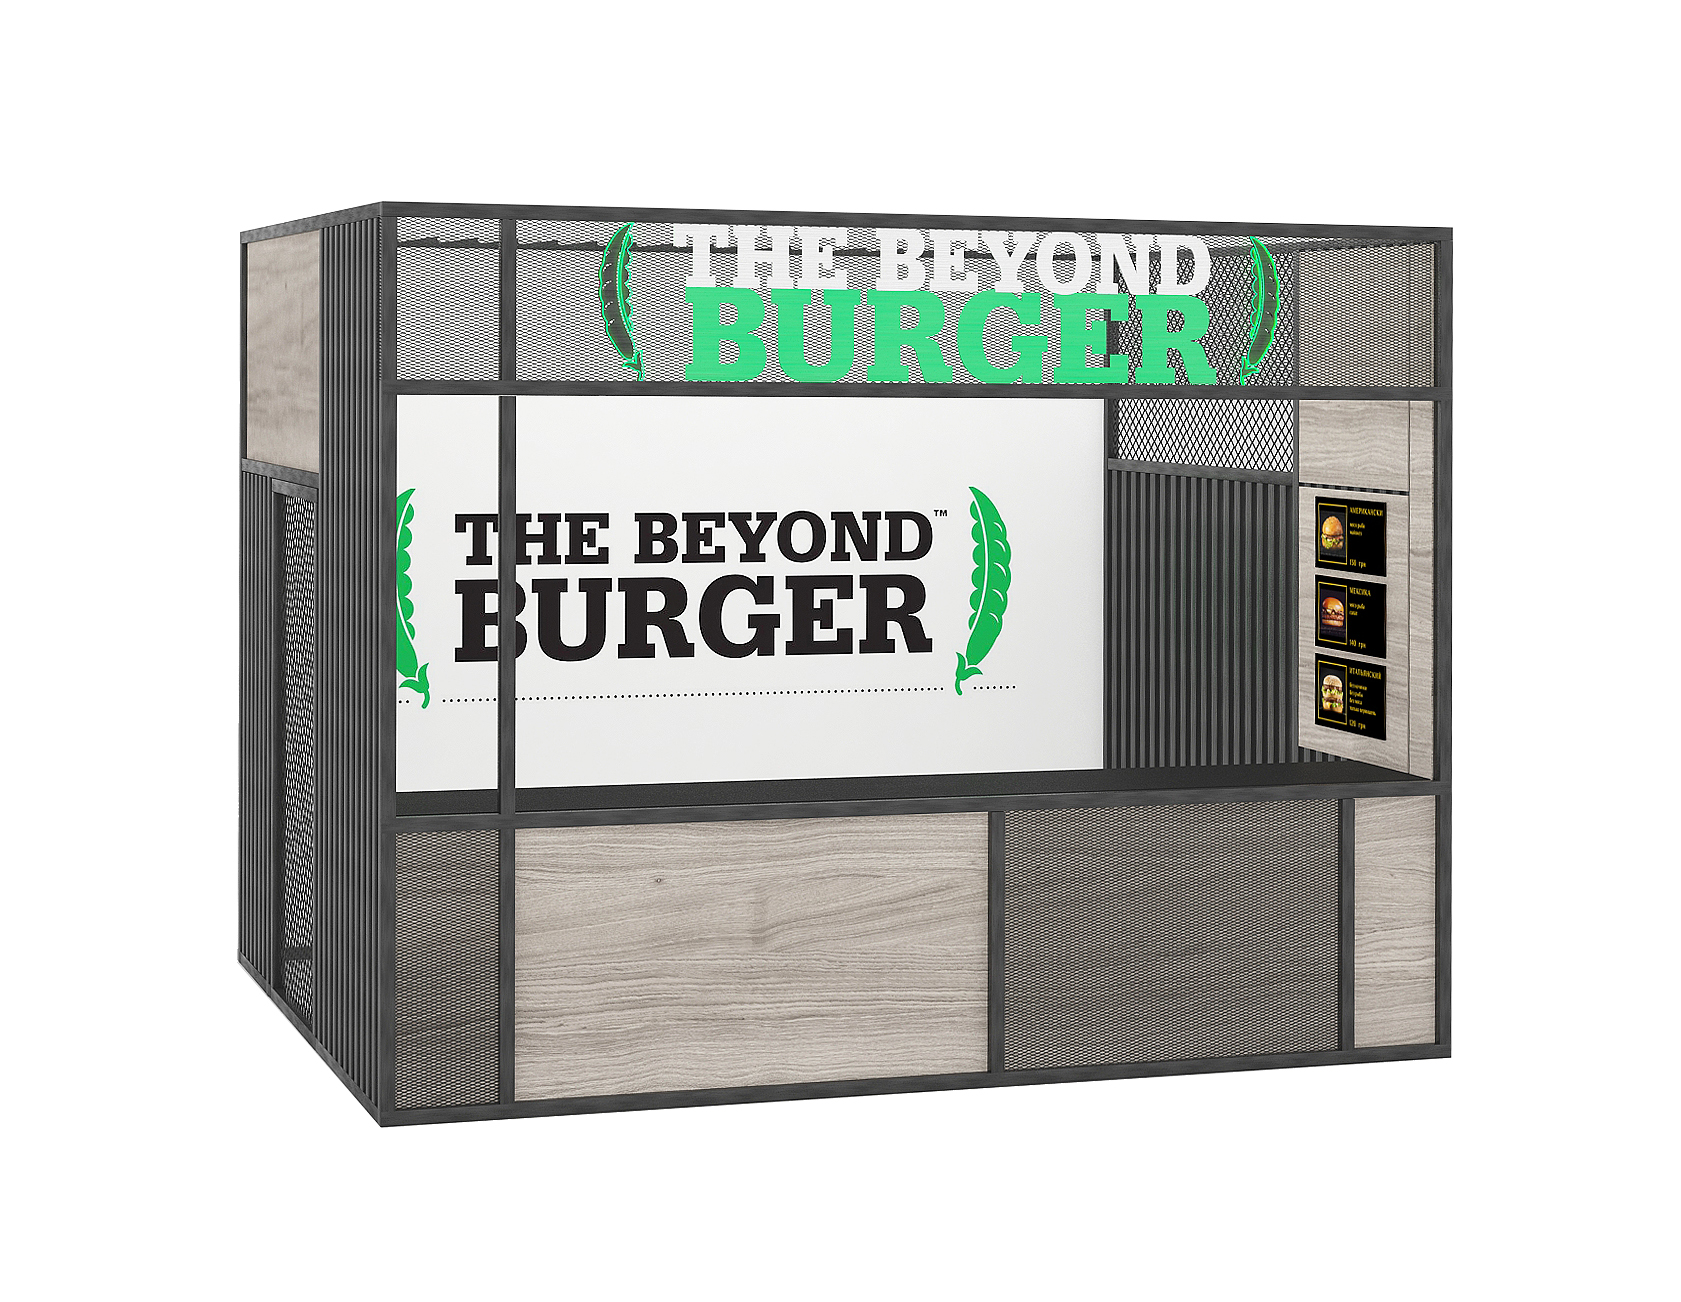 фуд-точка Beyond Burger